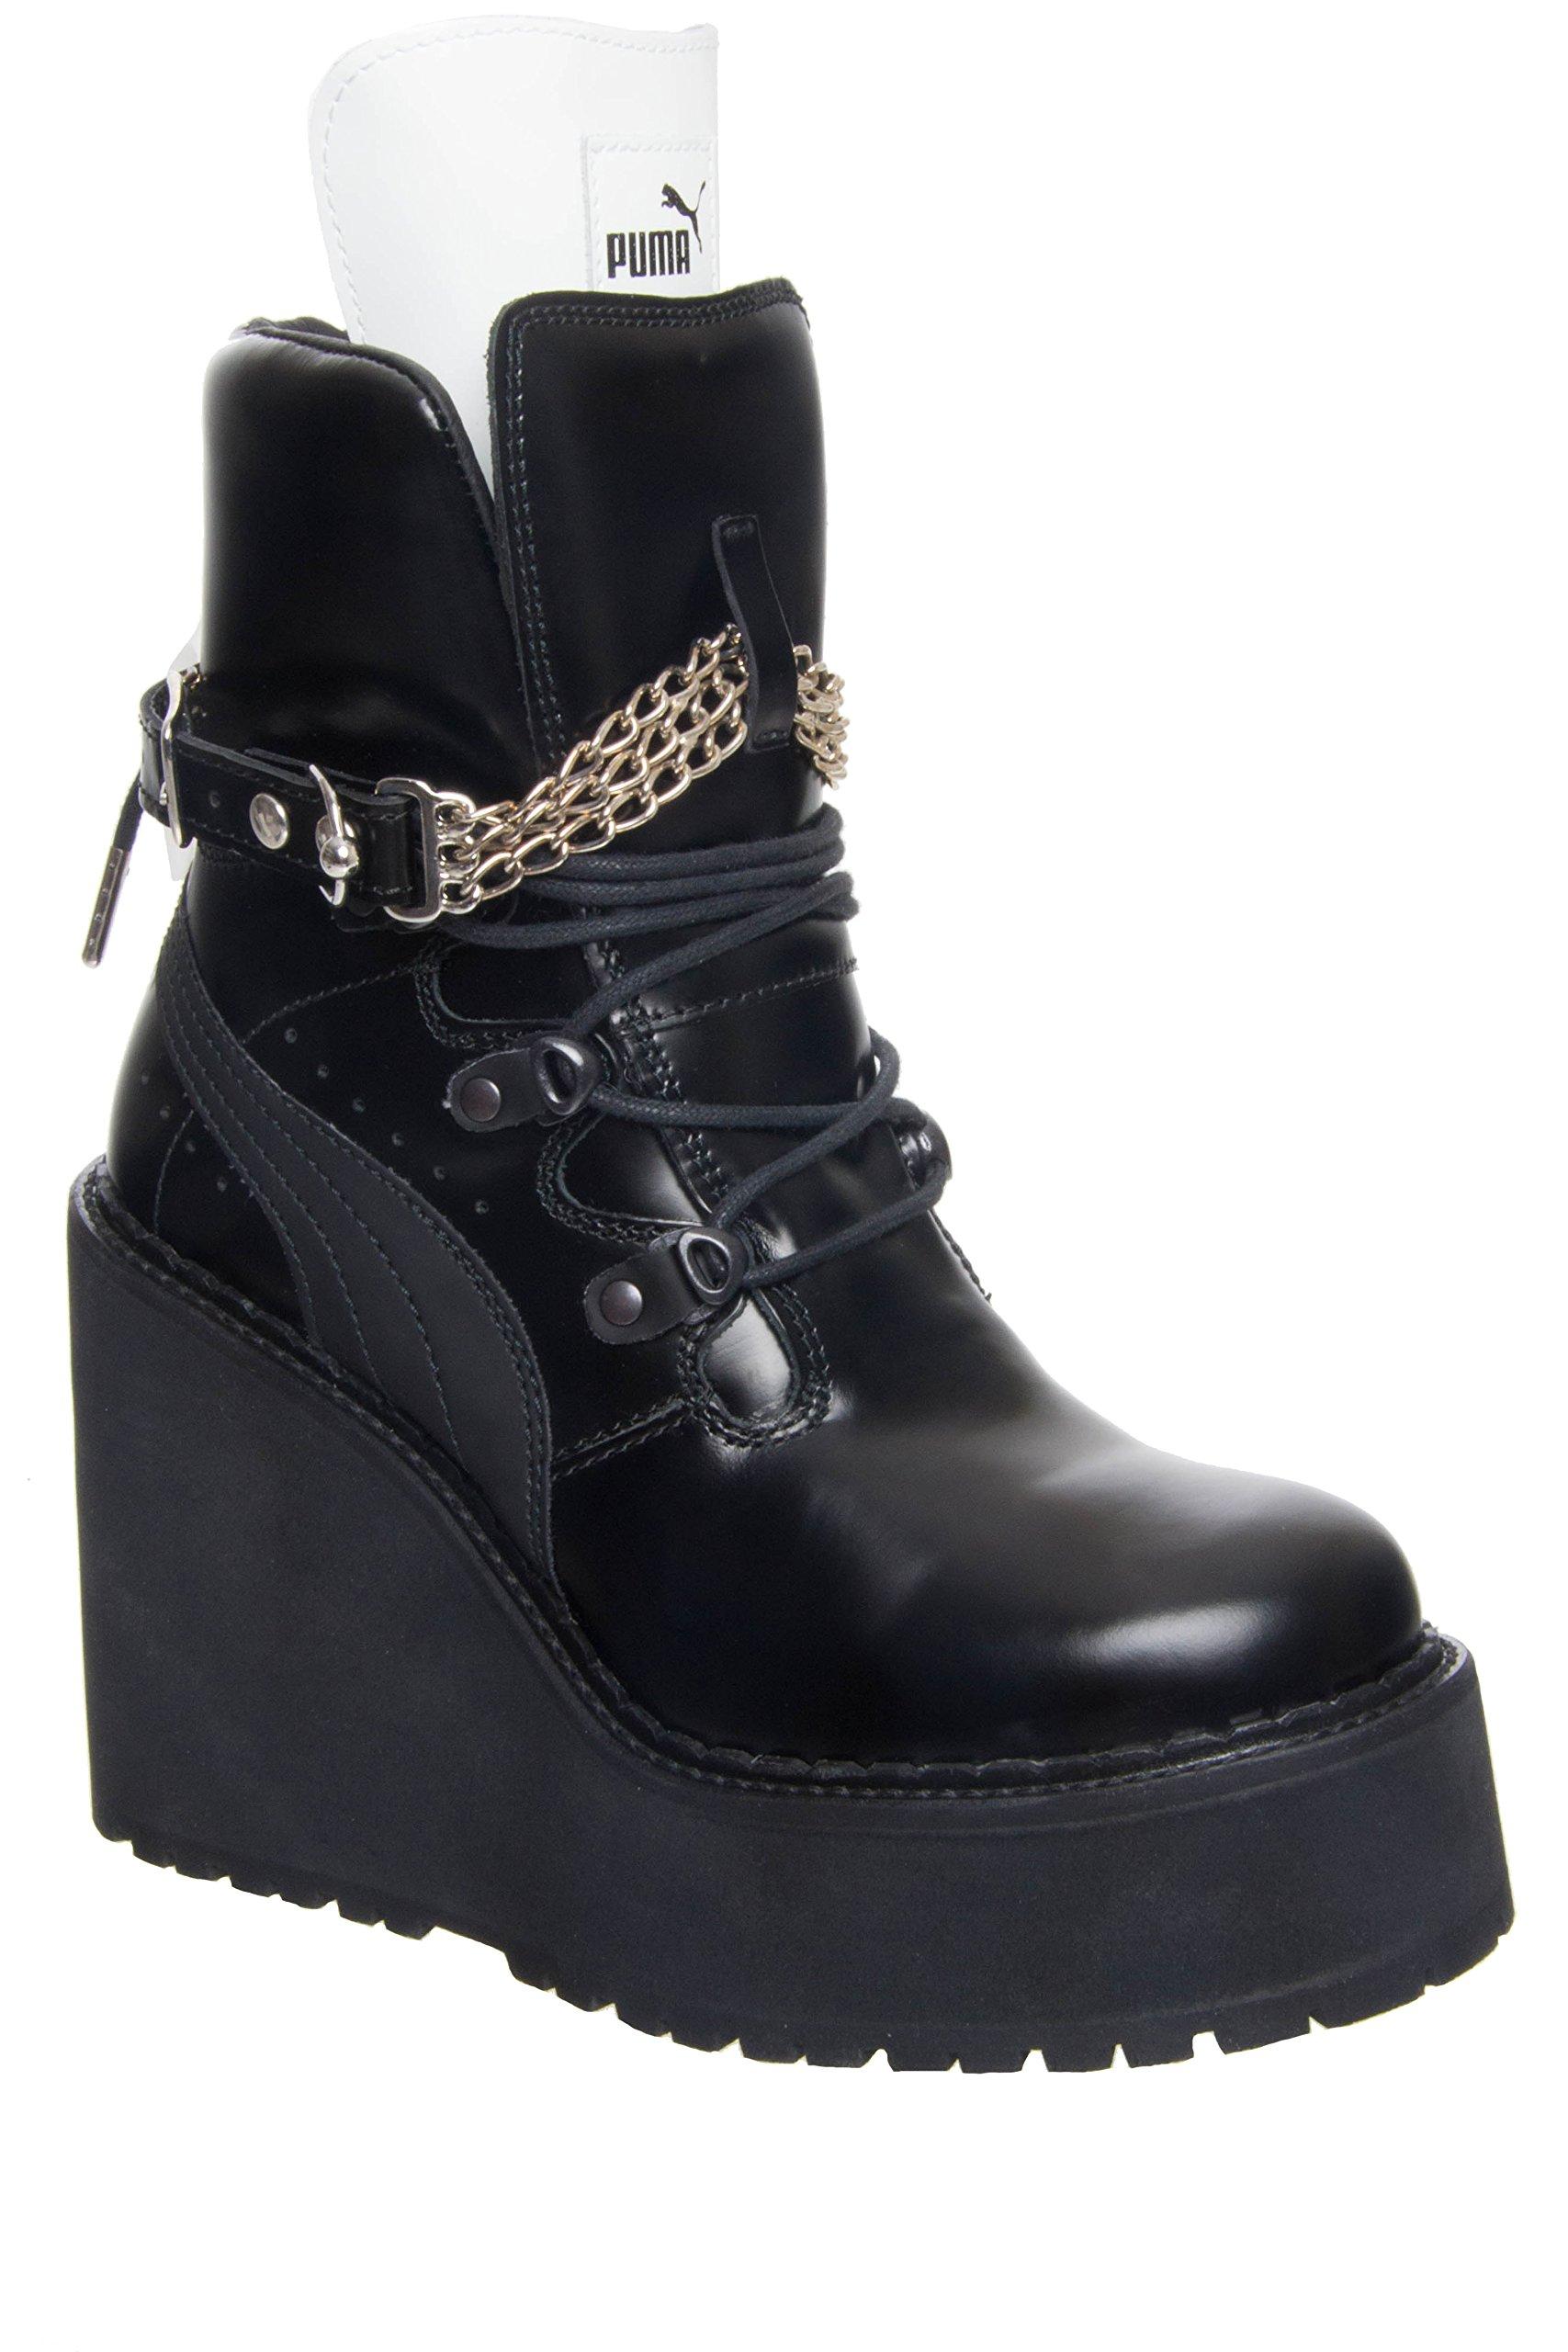 Puma Fenty x Rihanna Sneaker Boot Wedge - Black - Size 5.5